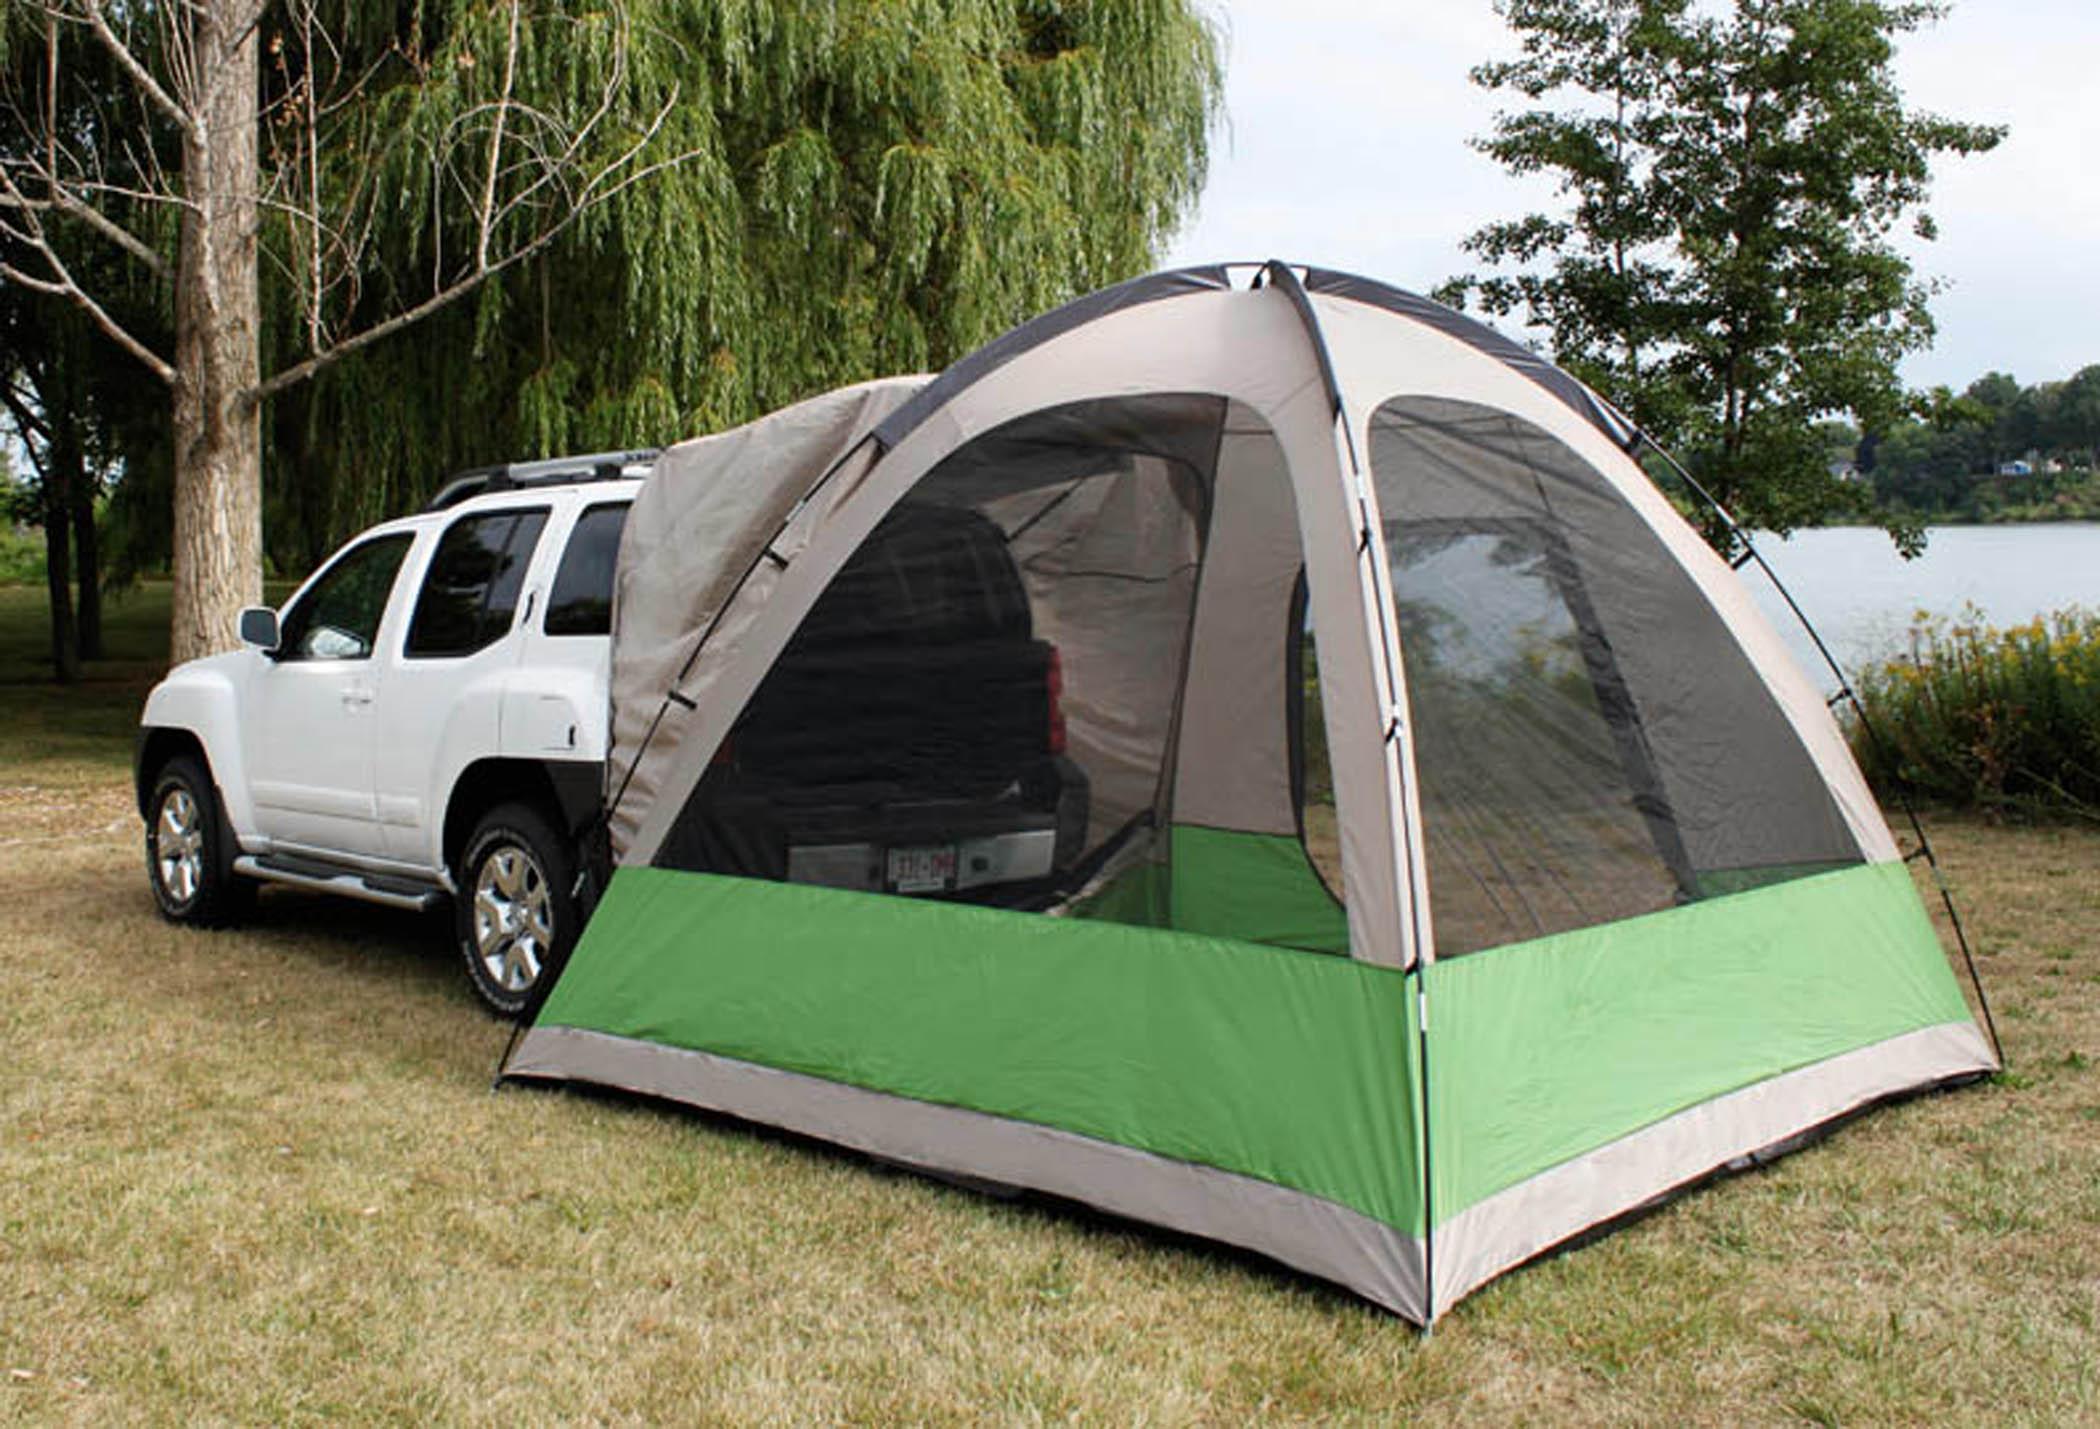 Napier Outdoors Backroadz #13100 SUV Tent & Outdoors Backroadz #13100 SUV Tent